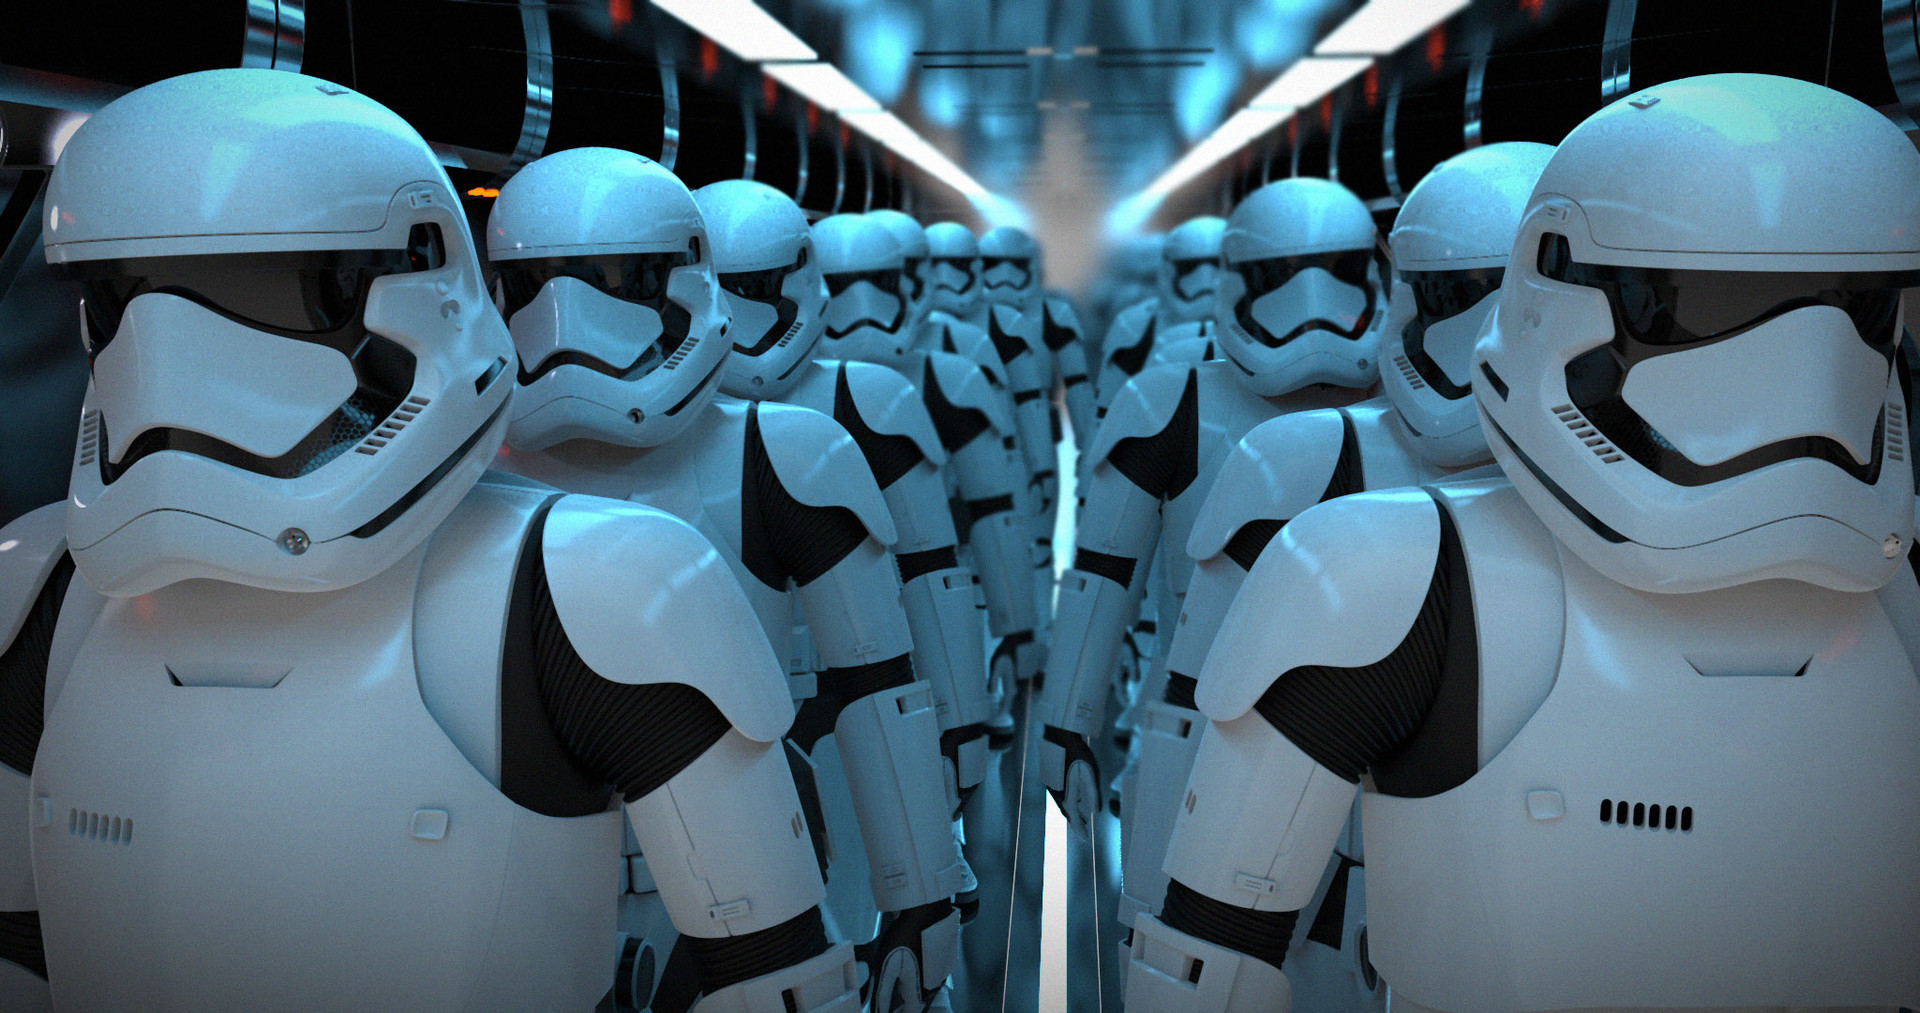 dmitrij-leppee-star-wars-troopers